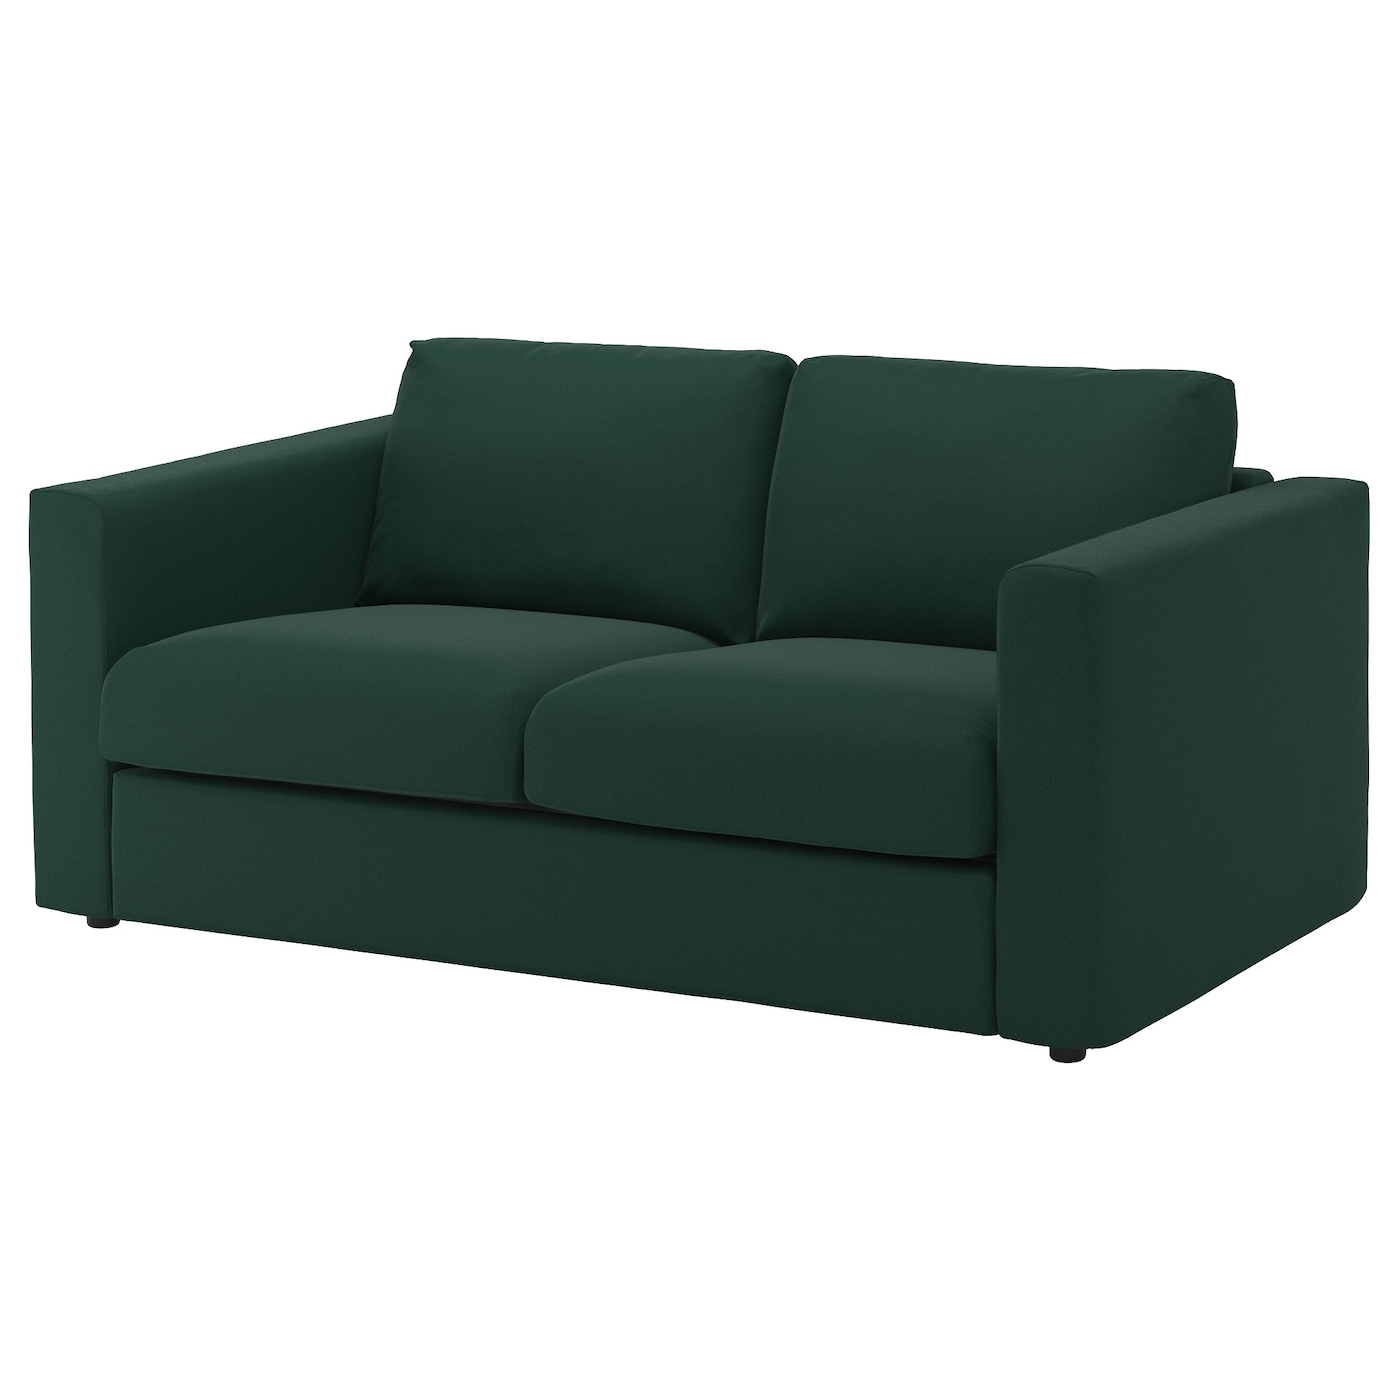 Vimle cover for 2 seat sofa gunnared dark green ikea for Dark green sectional sofa